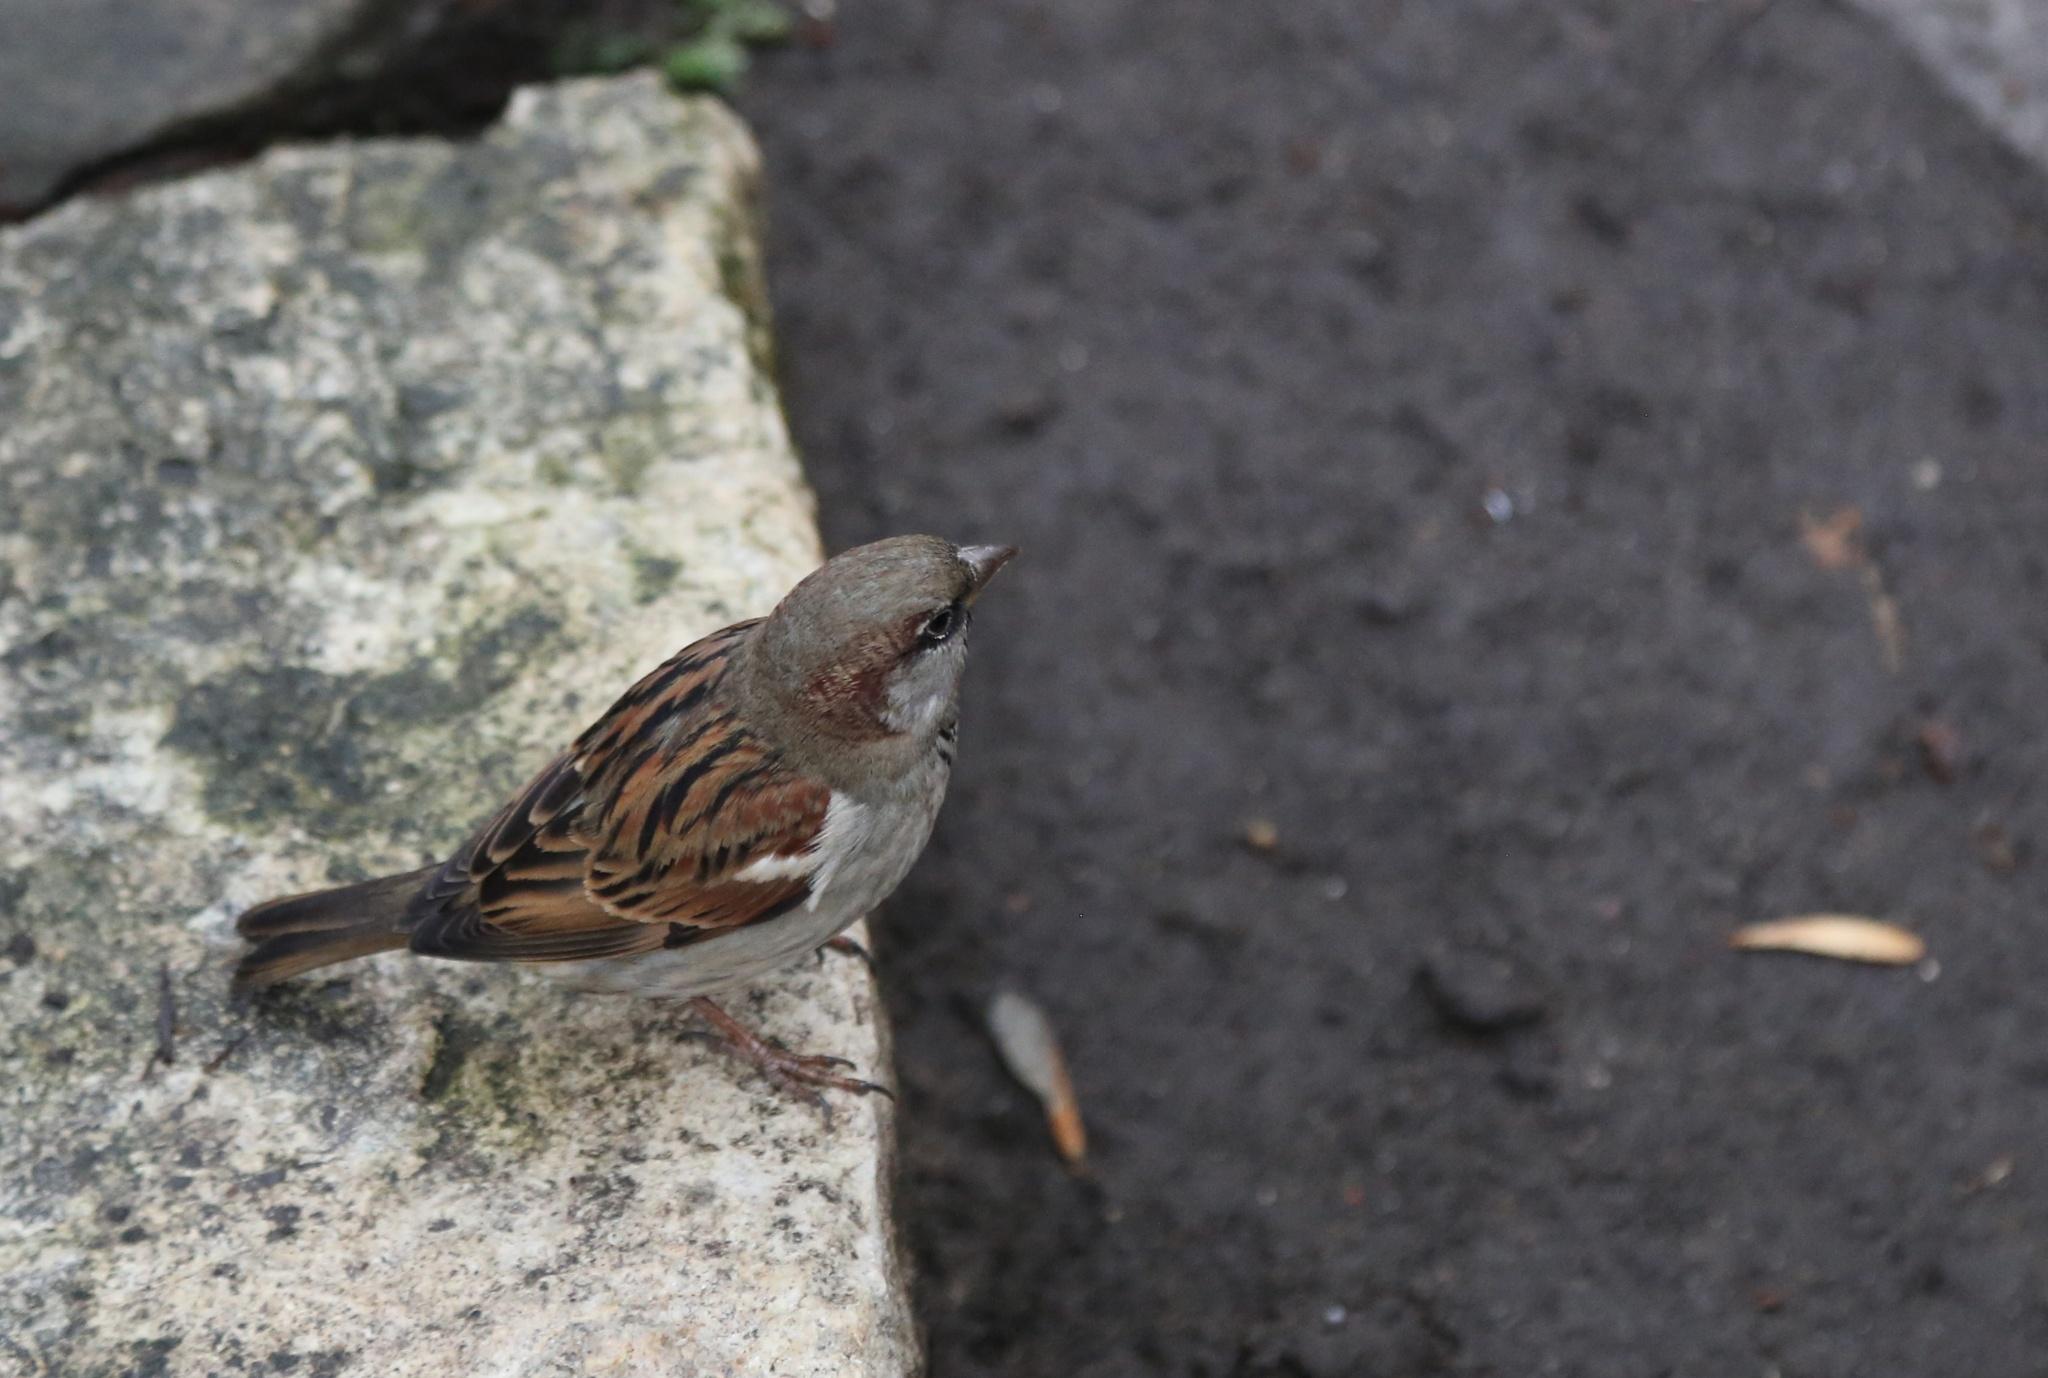 Little bird by Debbie Engelbrecht